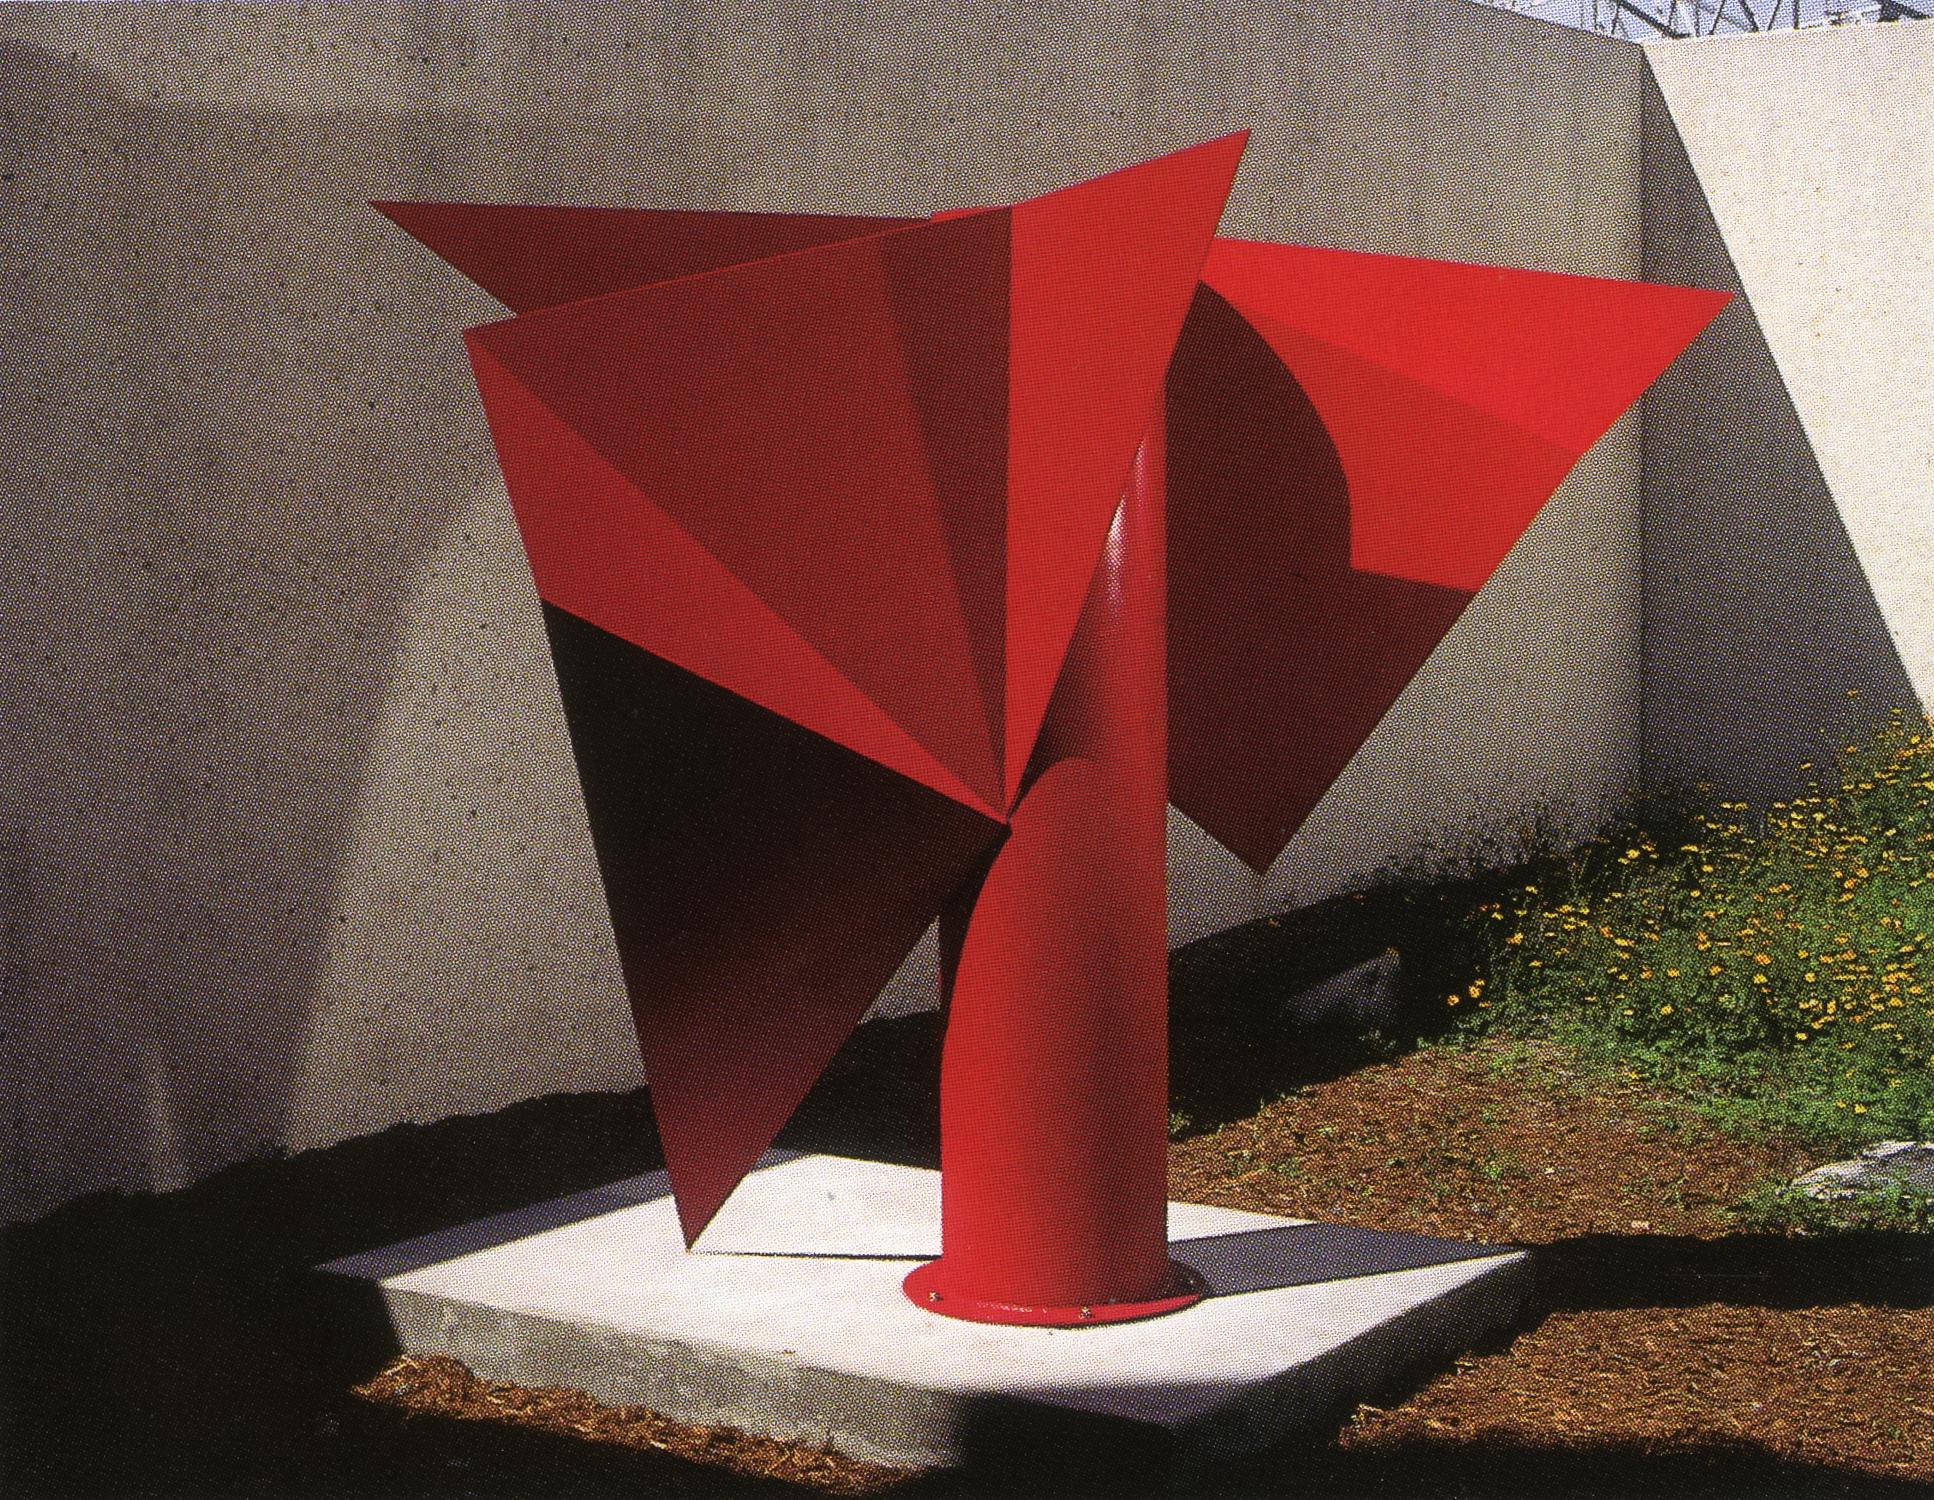 Art Museum of South Texas, Corpus Christi, Texas; 1995.  Atlas IX.  7.5' x 9.5' x 5'.